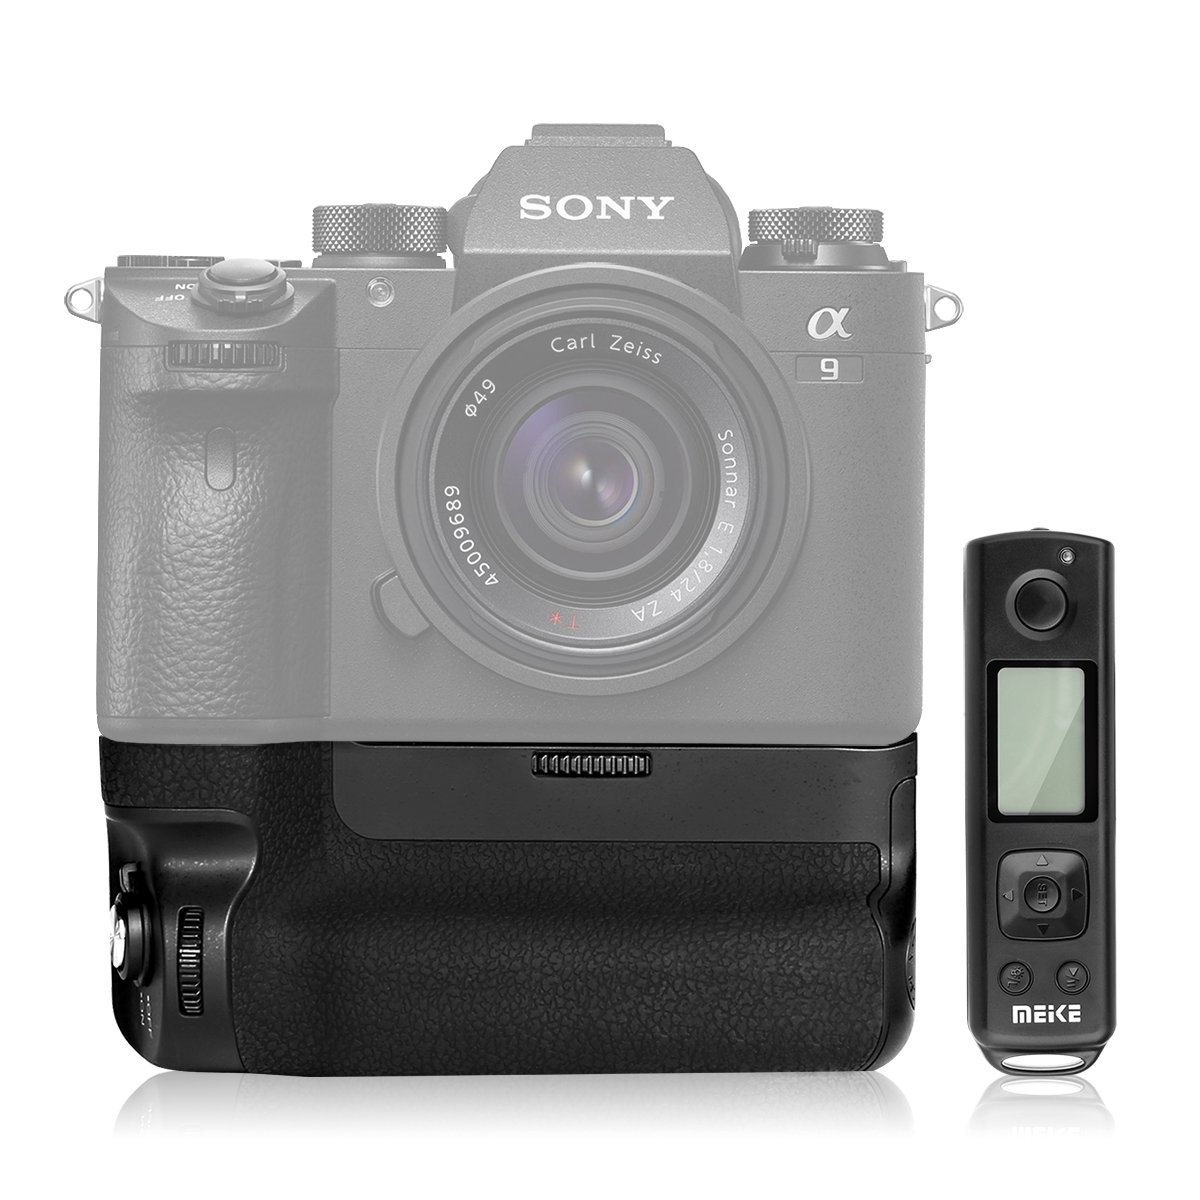 Батарейный блок Meike MK-A9 Pro с пультом для камер Sony A9, A7 III, A7R III и A7S III